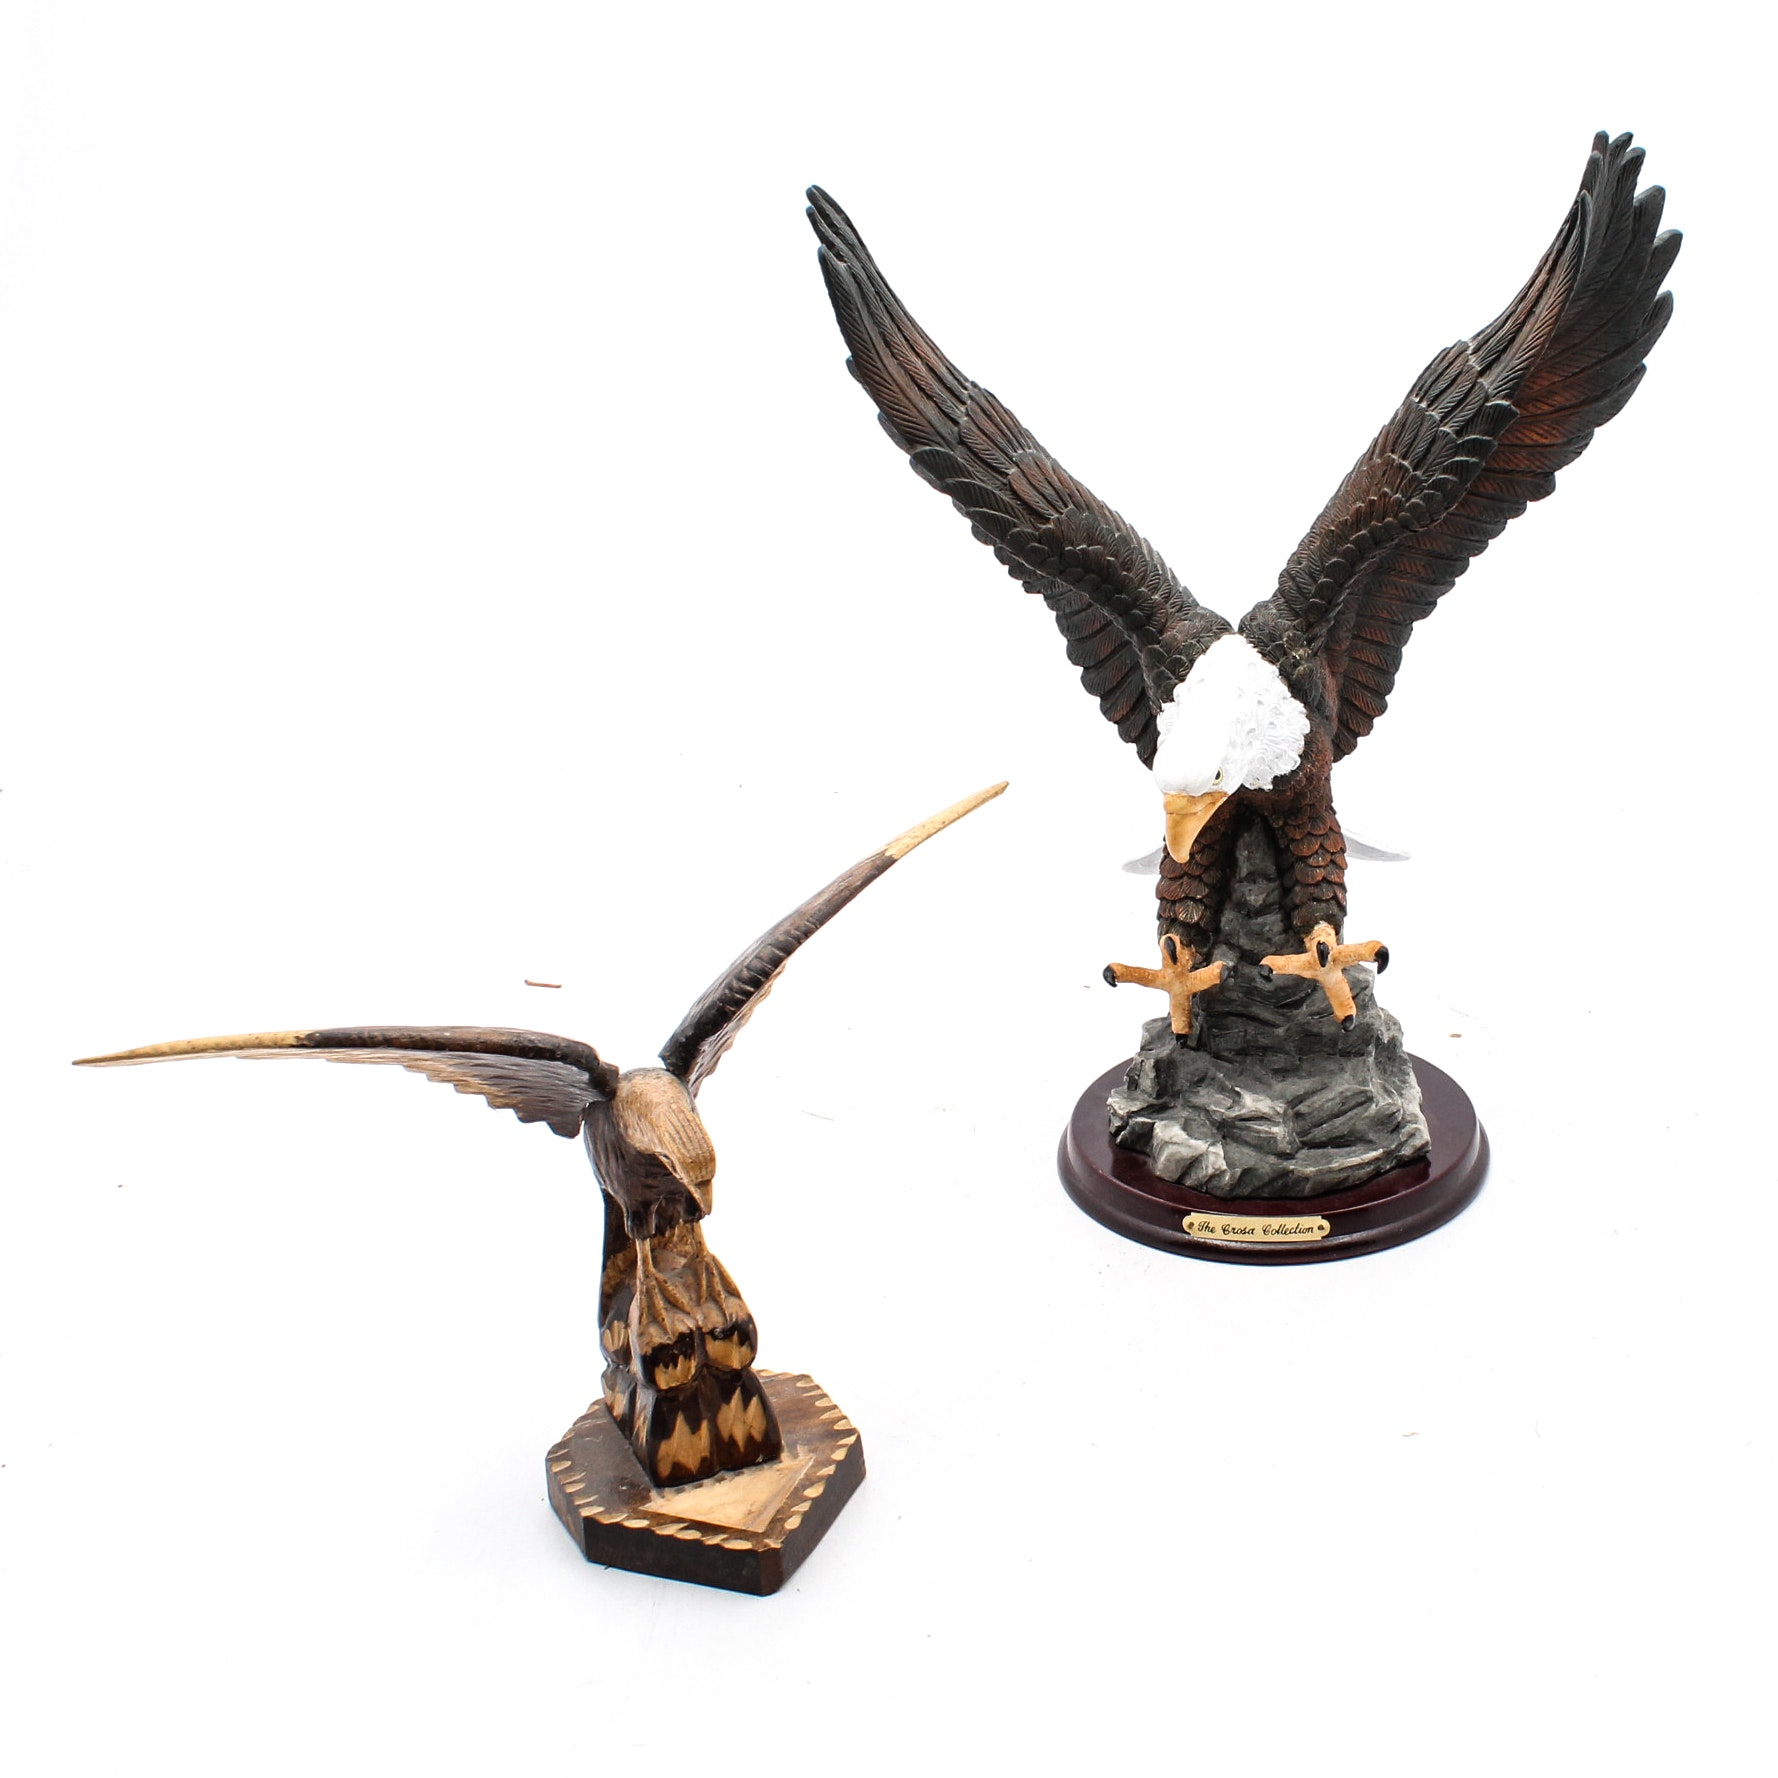 Bald Eagle Sculptures Featuring The Crosa Collection